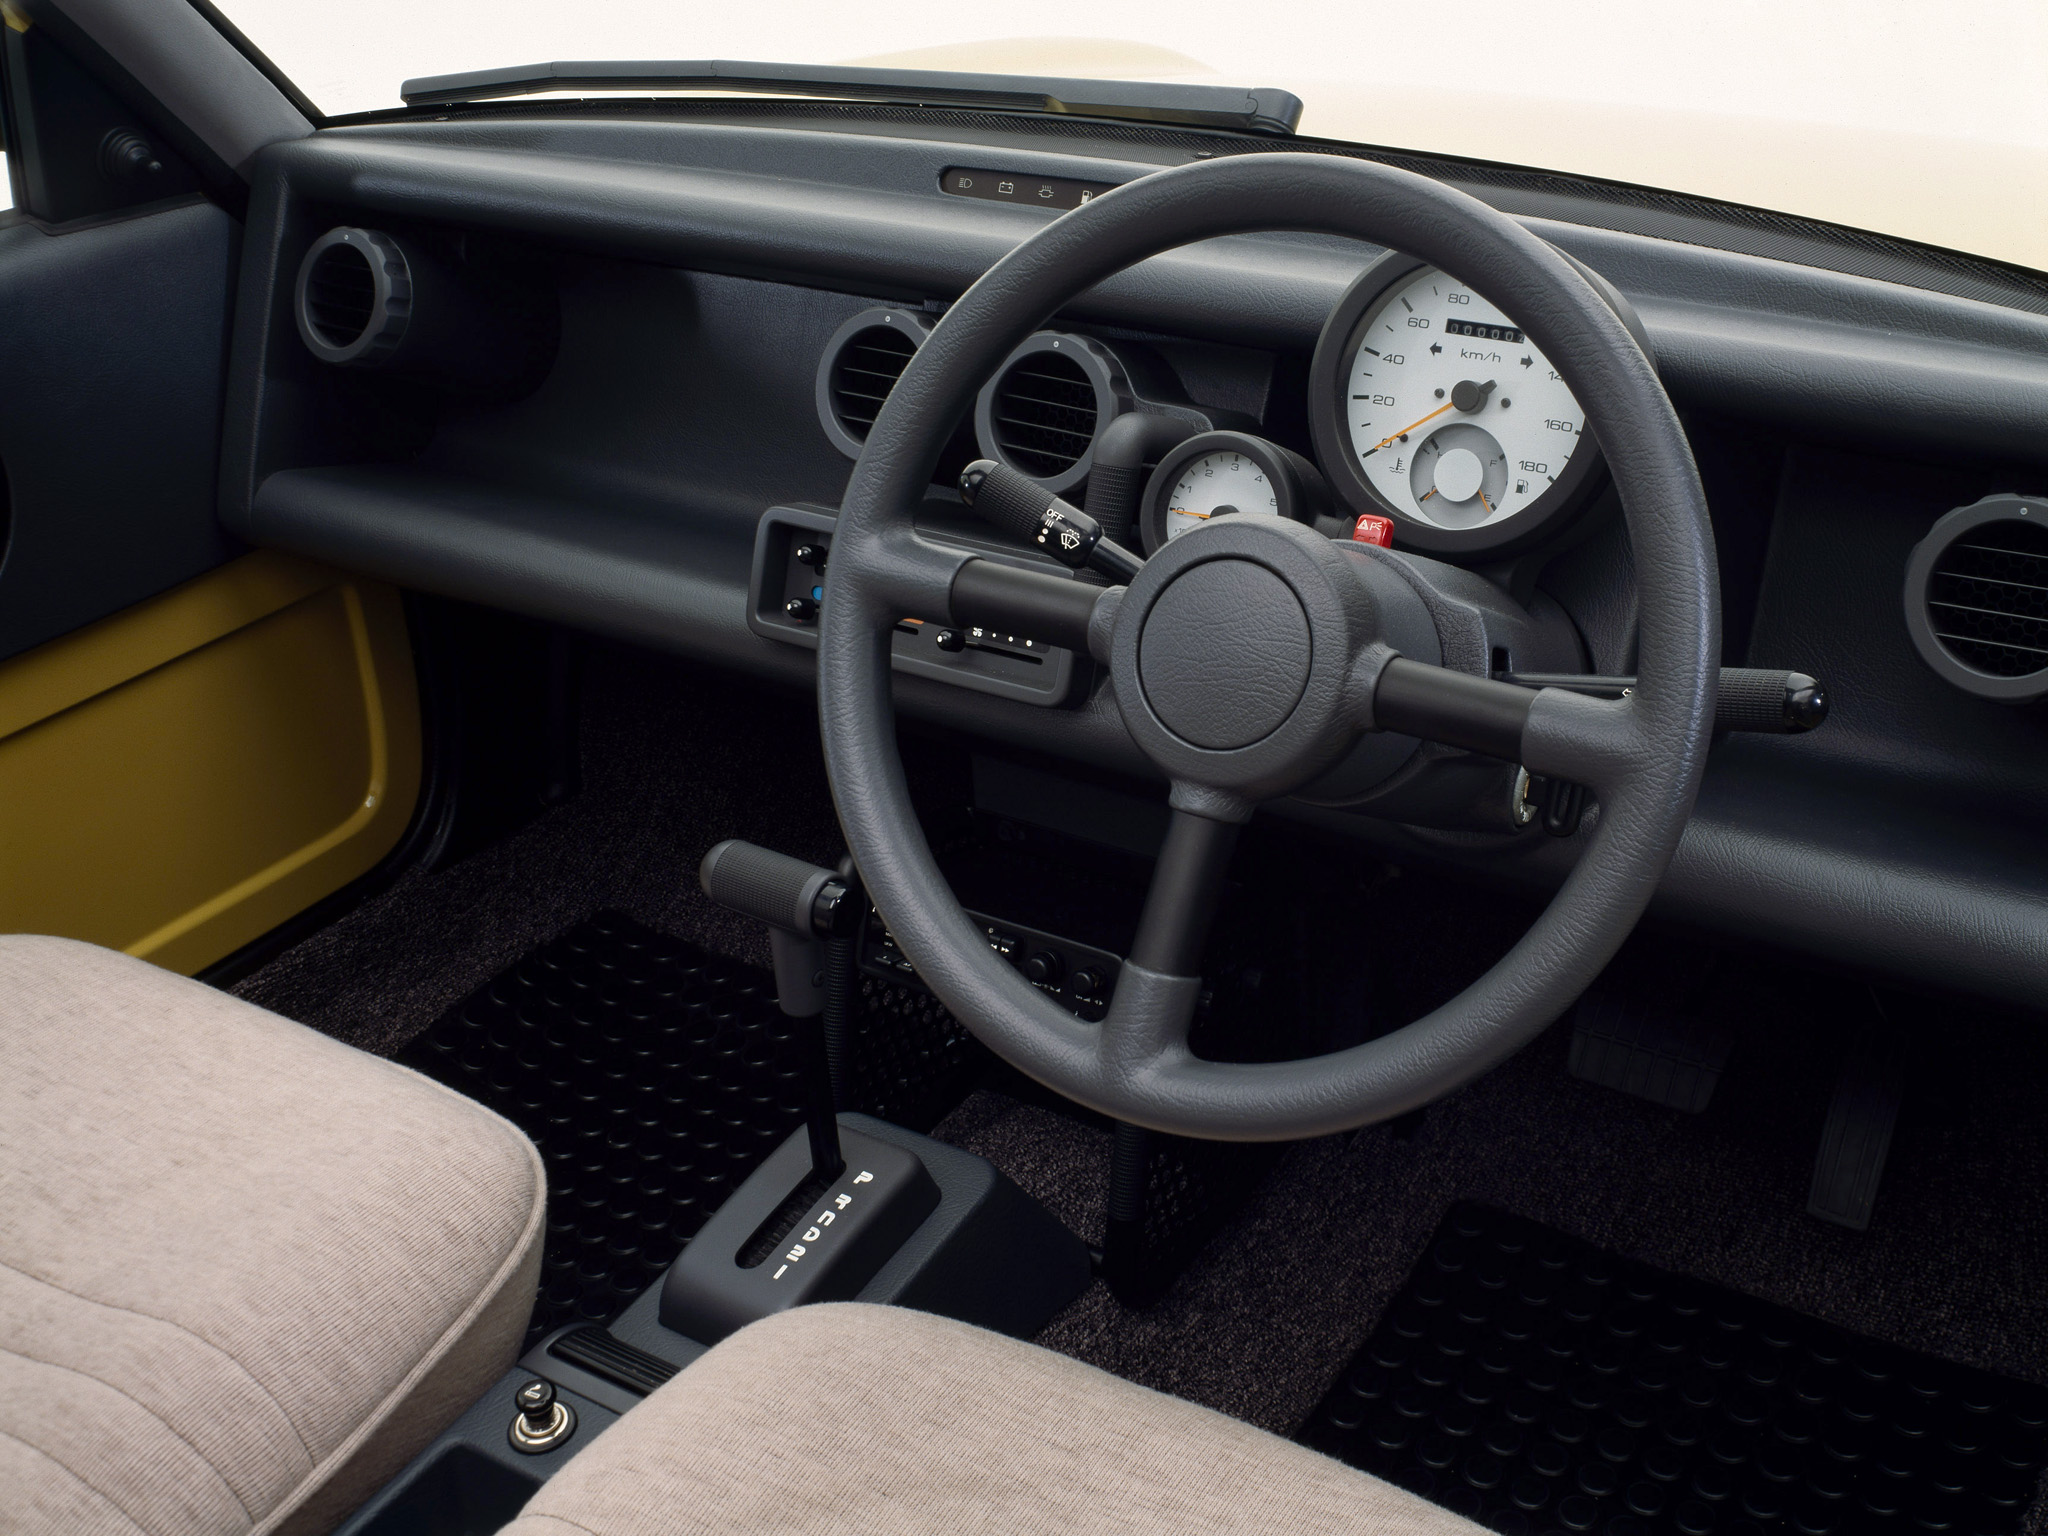 Nissan Be-1 interior